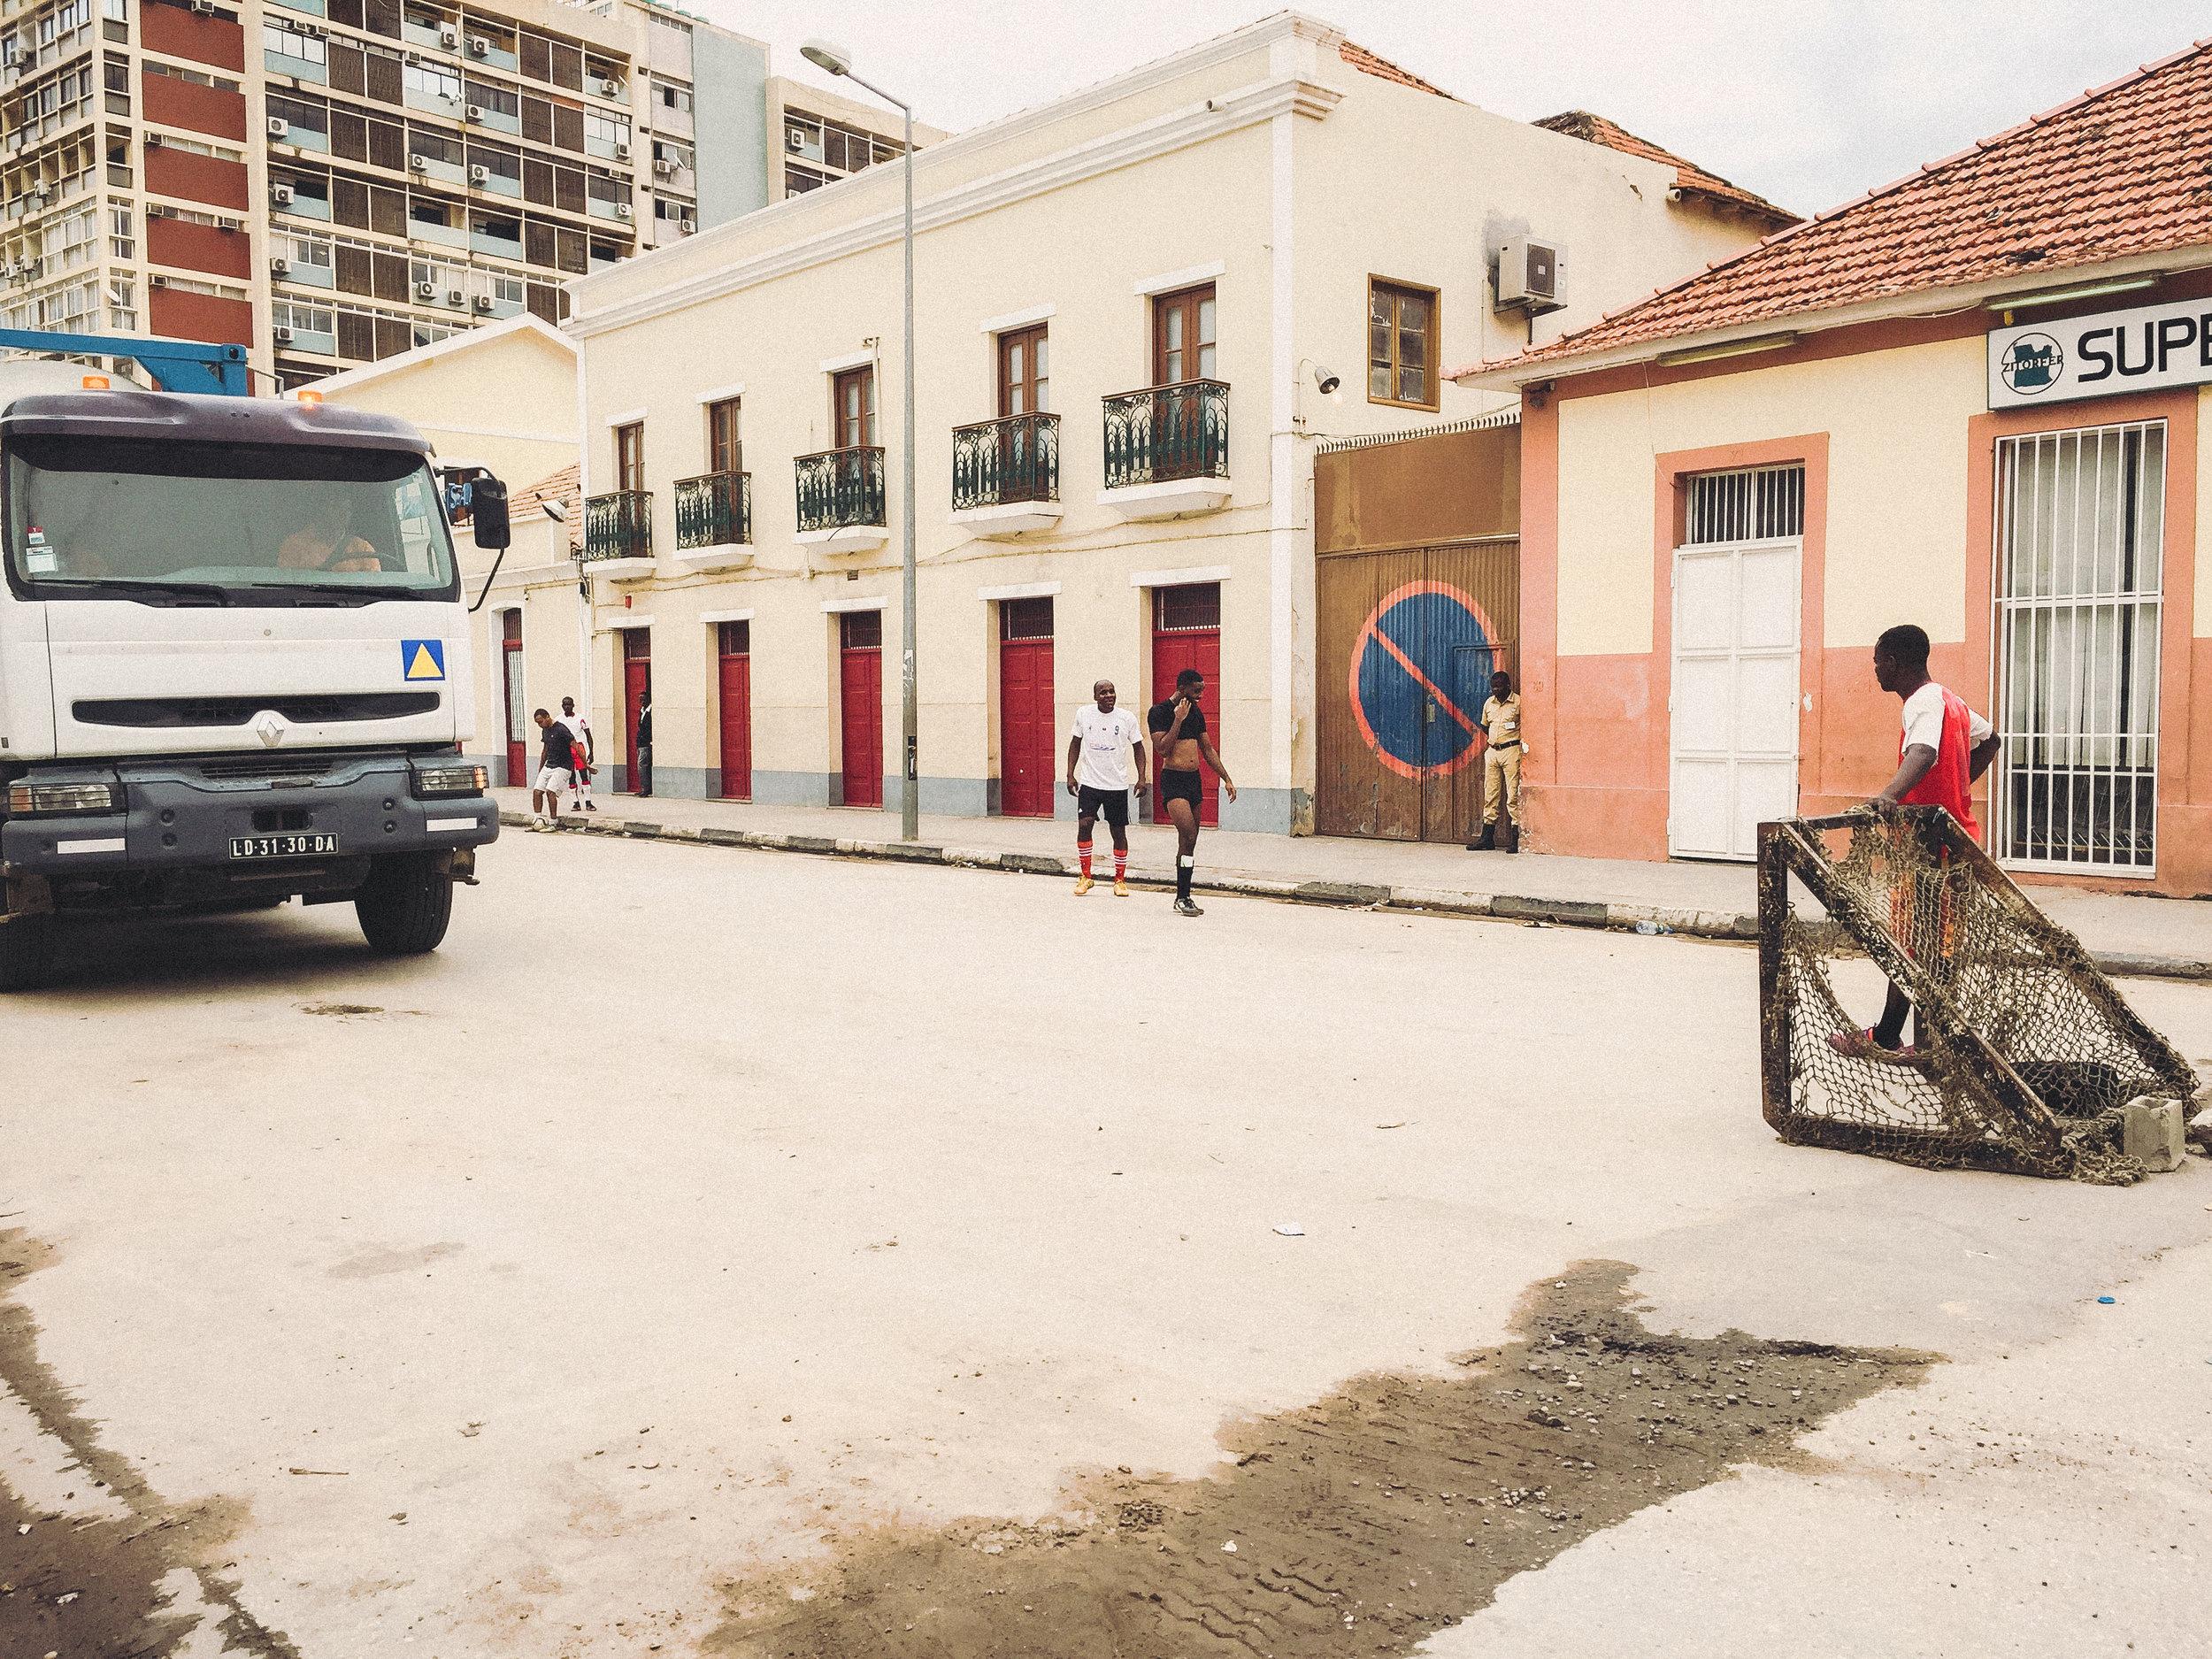 Angola Soccer by Mel D. Cole 2015-4.jpg